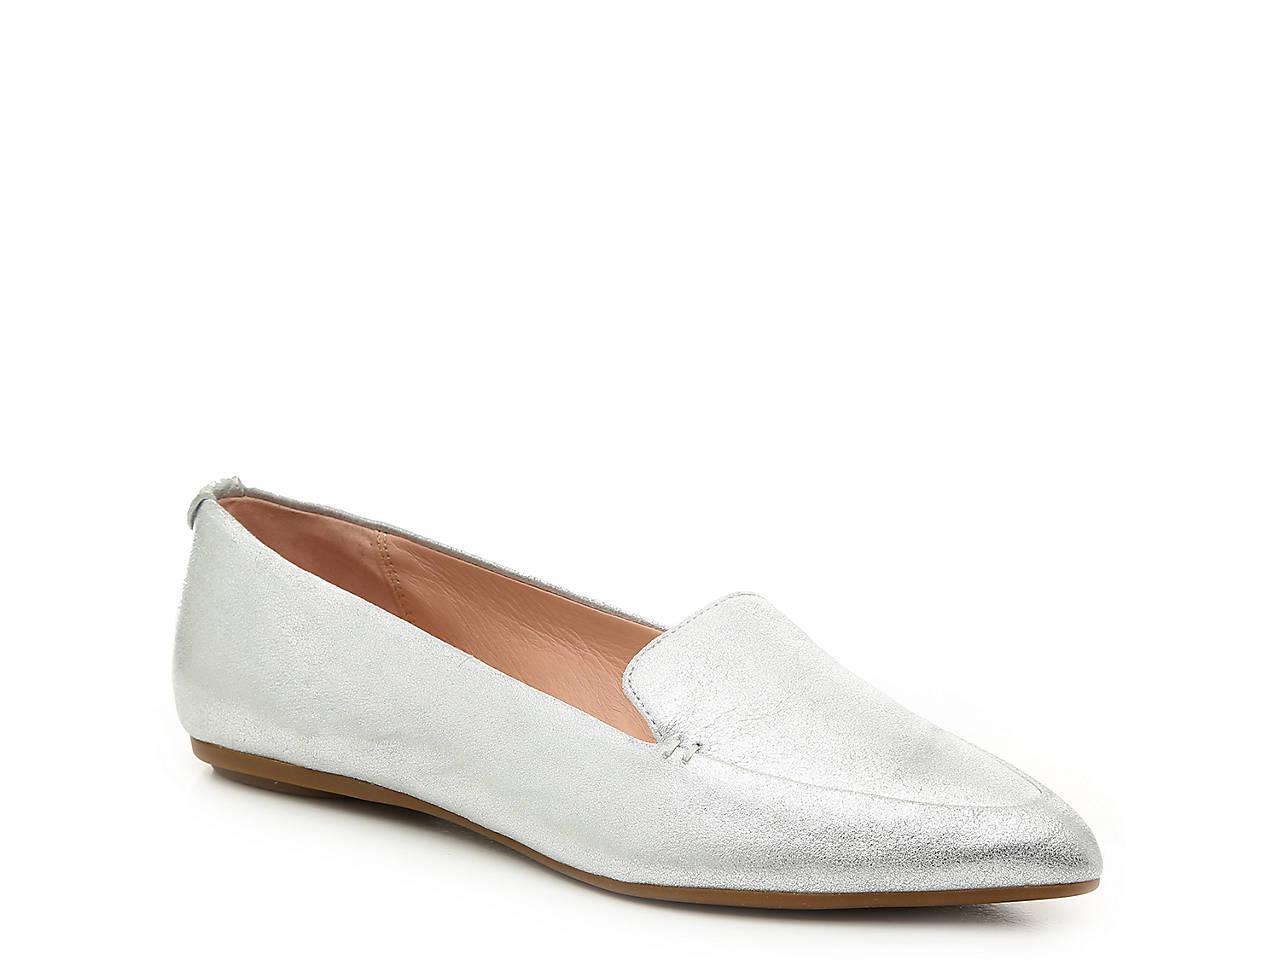 42b5d8eb35a Taryn Rose Faye Loafer Women s Shoes